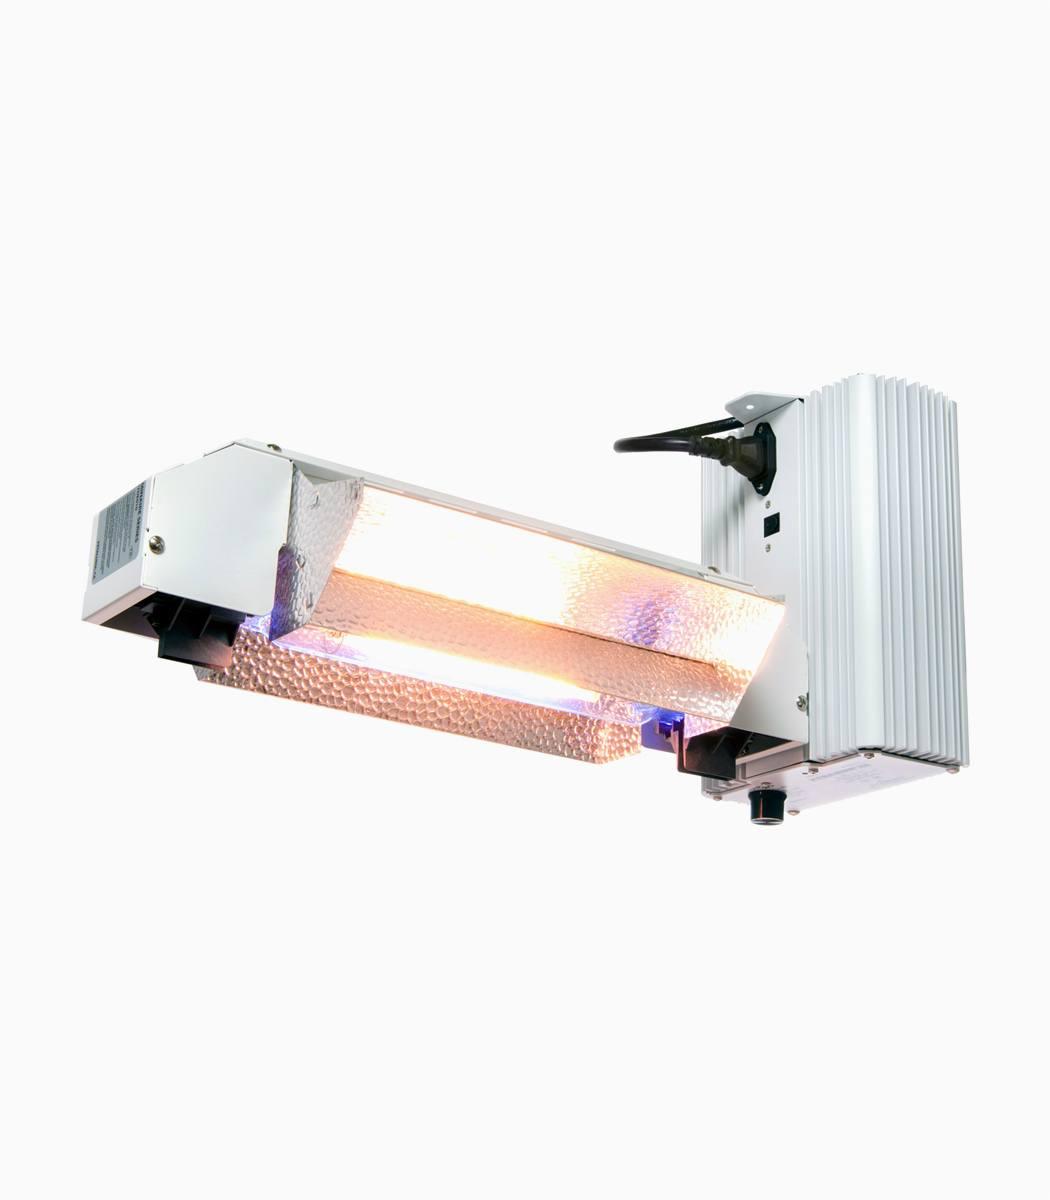 Xtrasun De Lighting System Open 1000W 240V